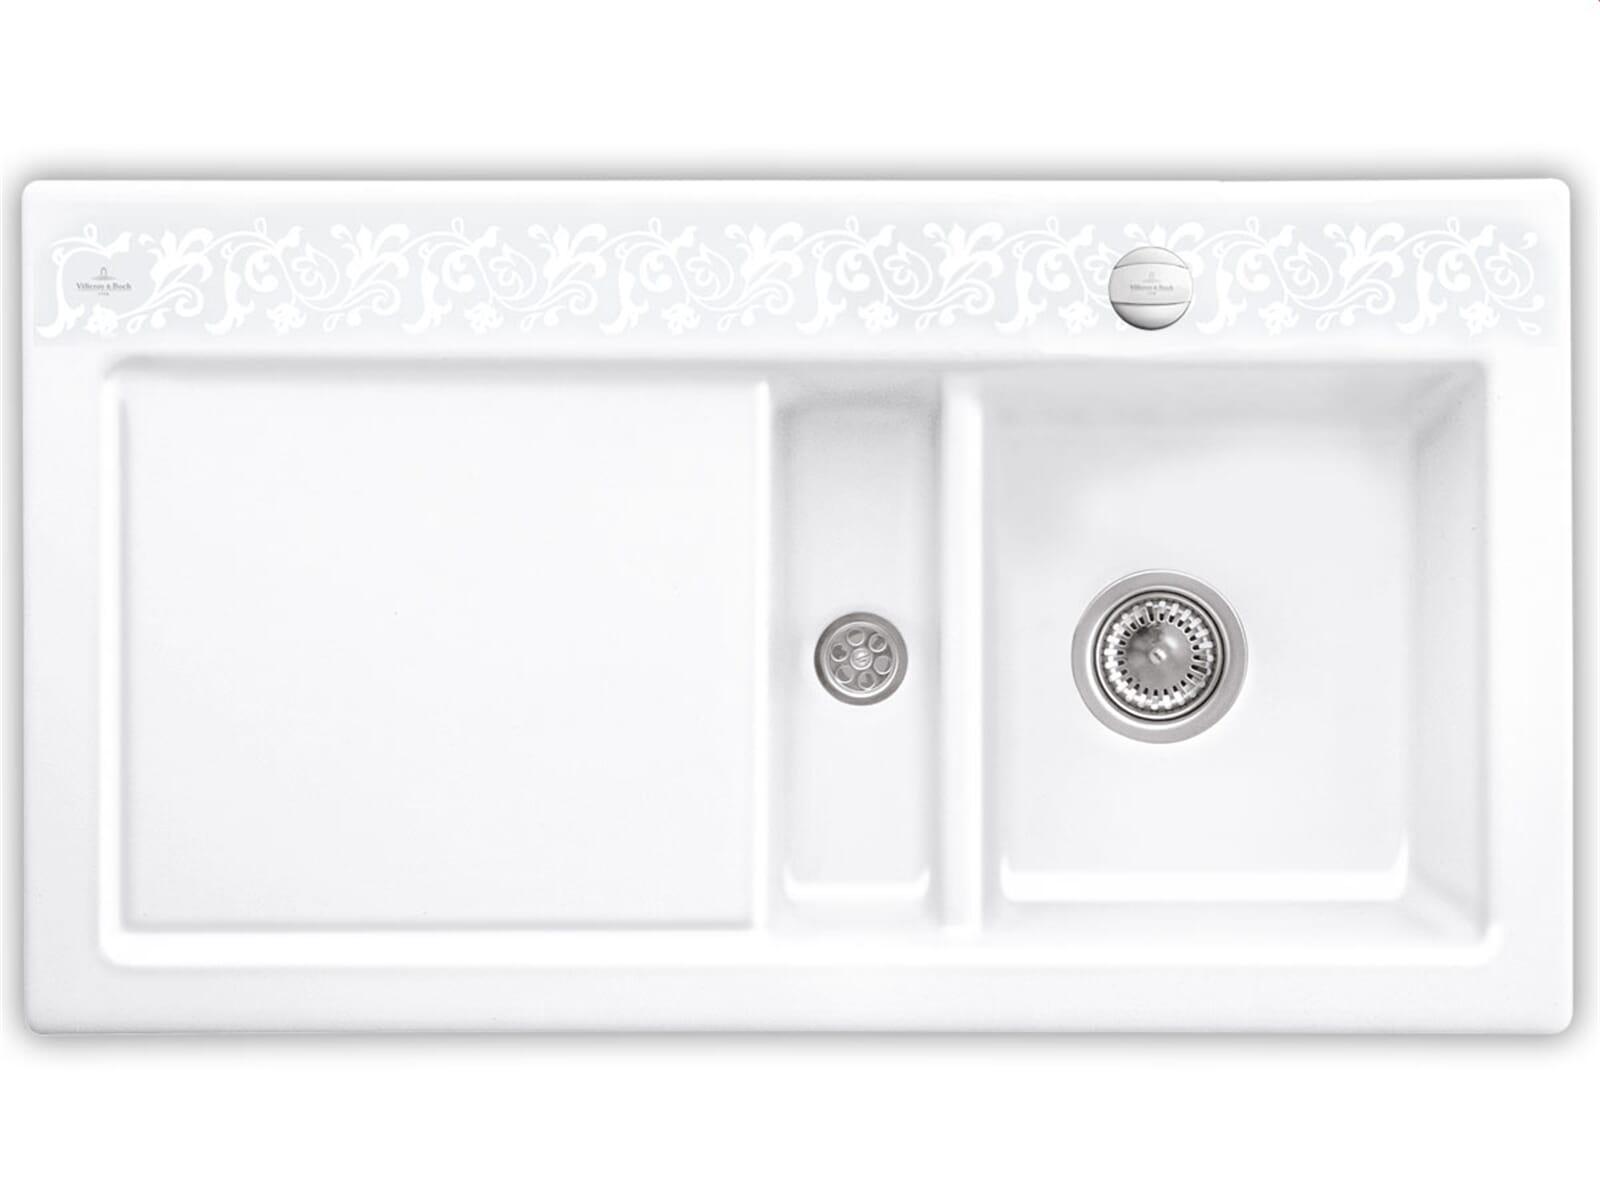 Villeroy & Boch Subway 50 White Pearl - 6713 02 KT Keramikspüle Exzenterbetätigung